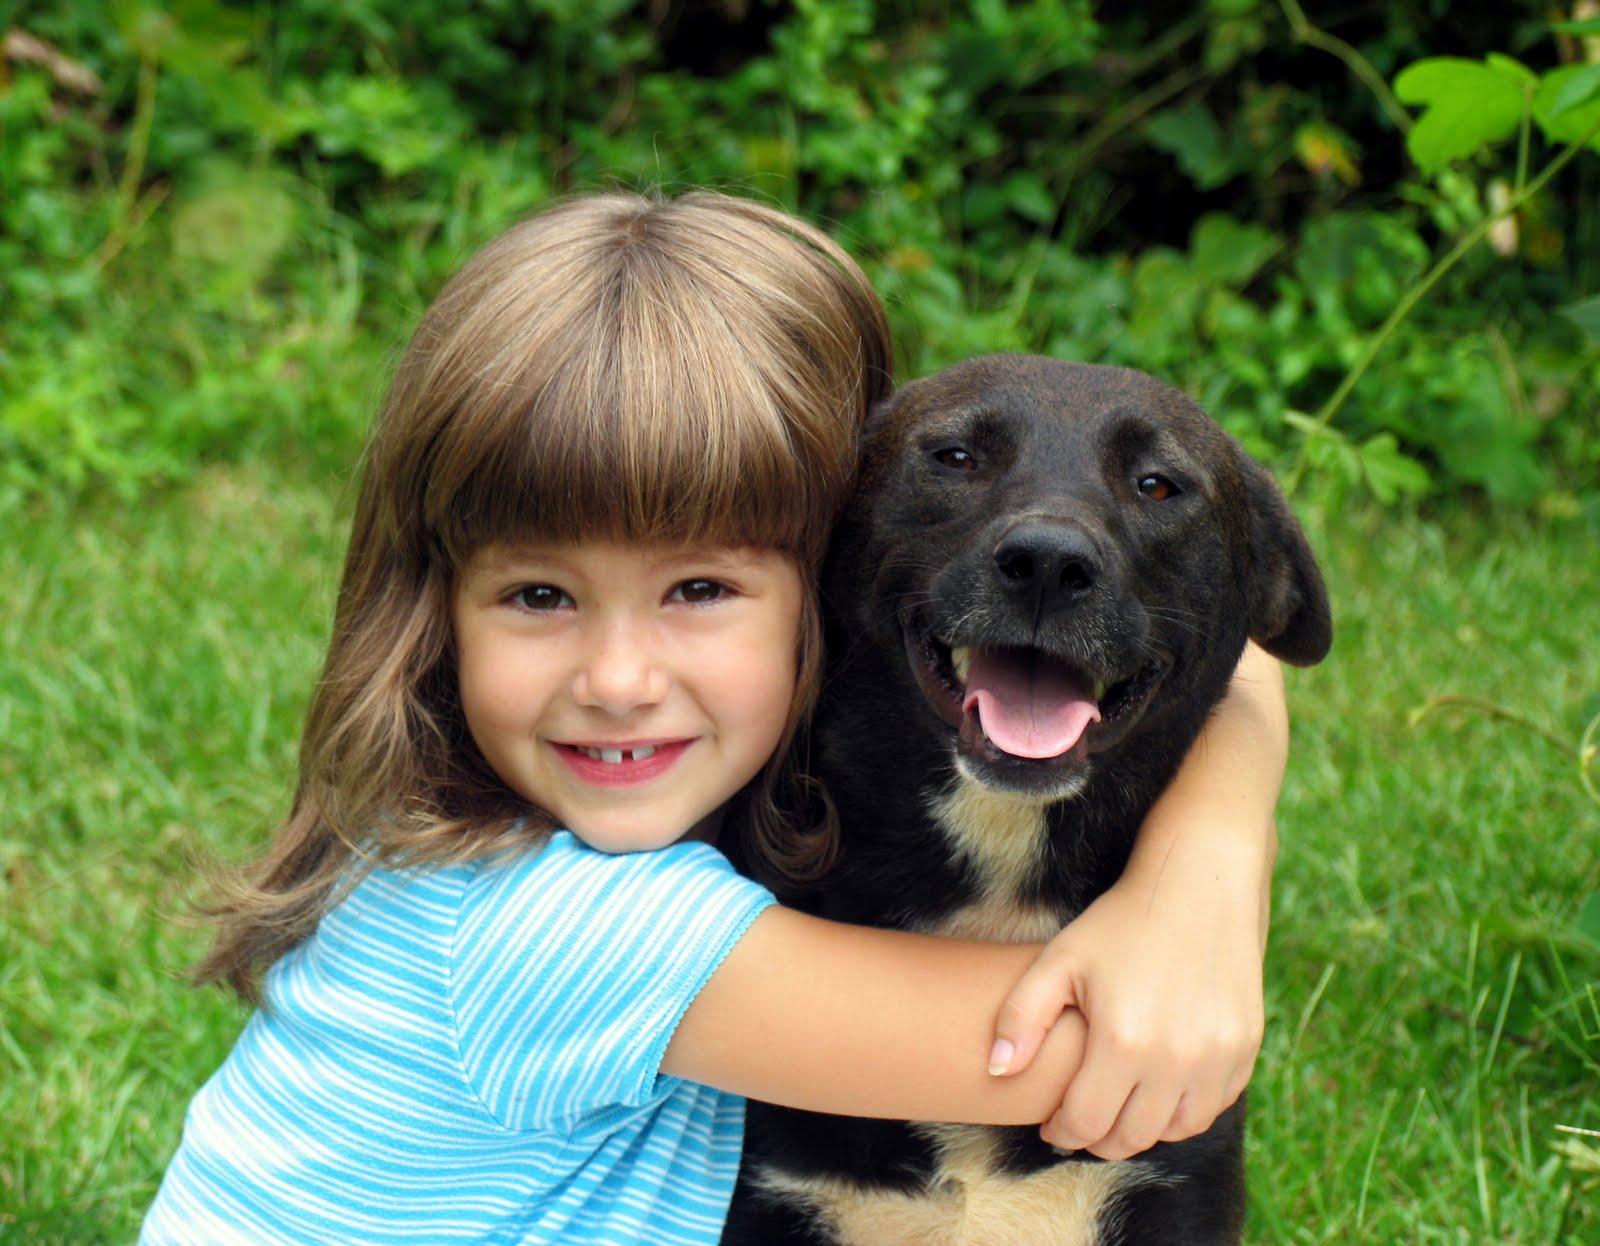 http://1.bp.blogspot.com/-yRV5Unj00lc/TdDCIj71IYI/AAAAAAAAAUo/mHRuwkR-HKA/s1600/Cute+Dogs+Pictures+Wallpapers+%252812%2529.jpg